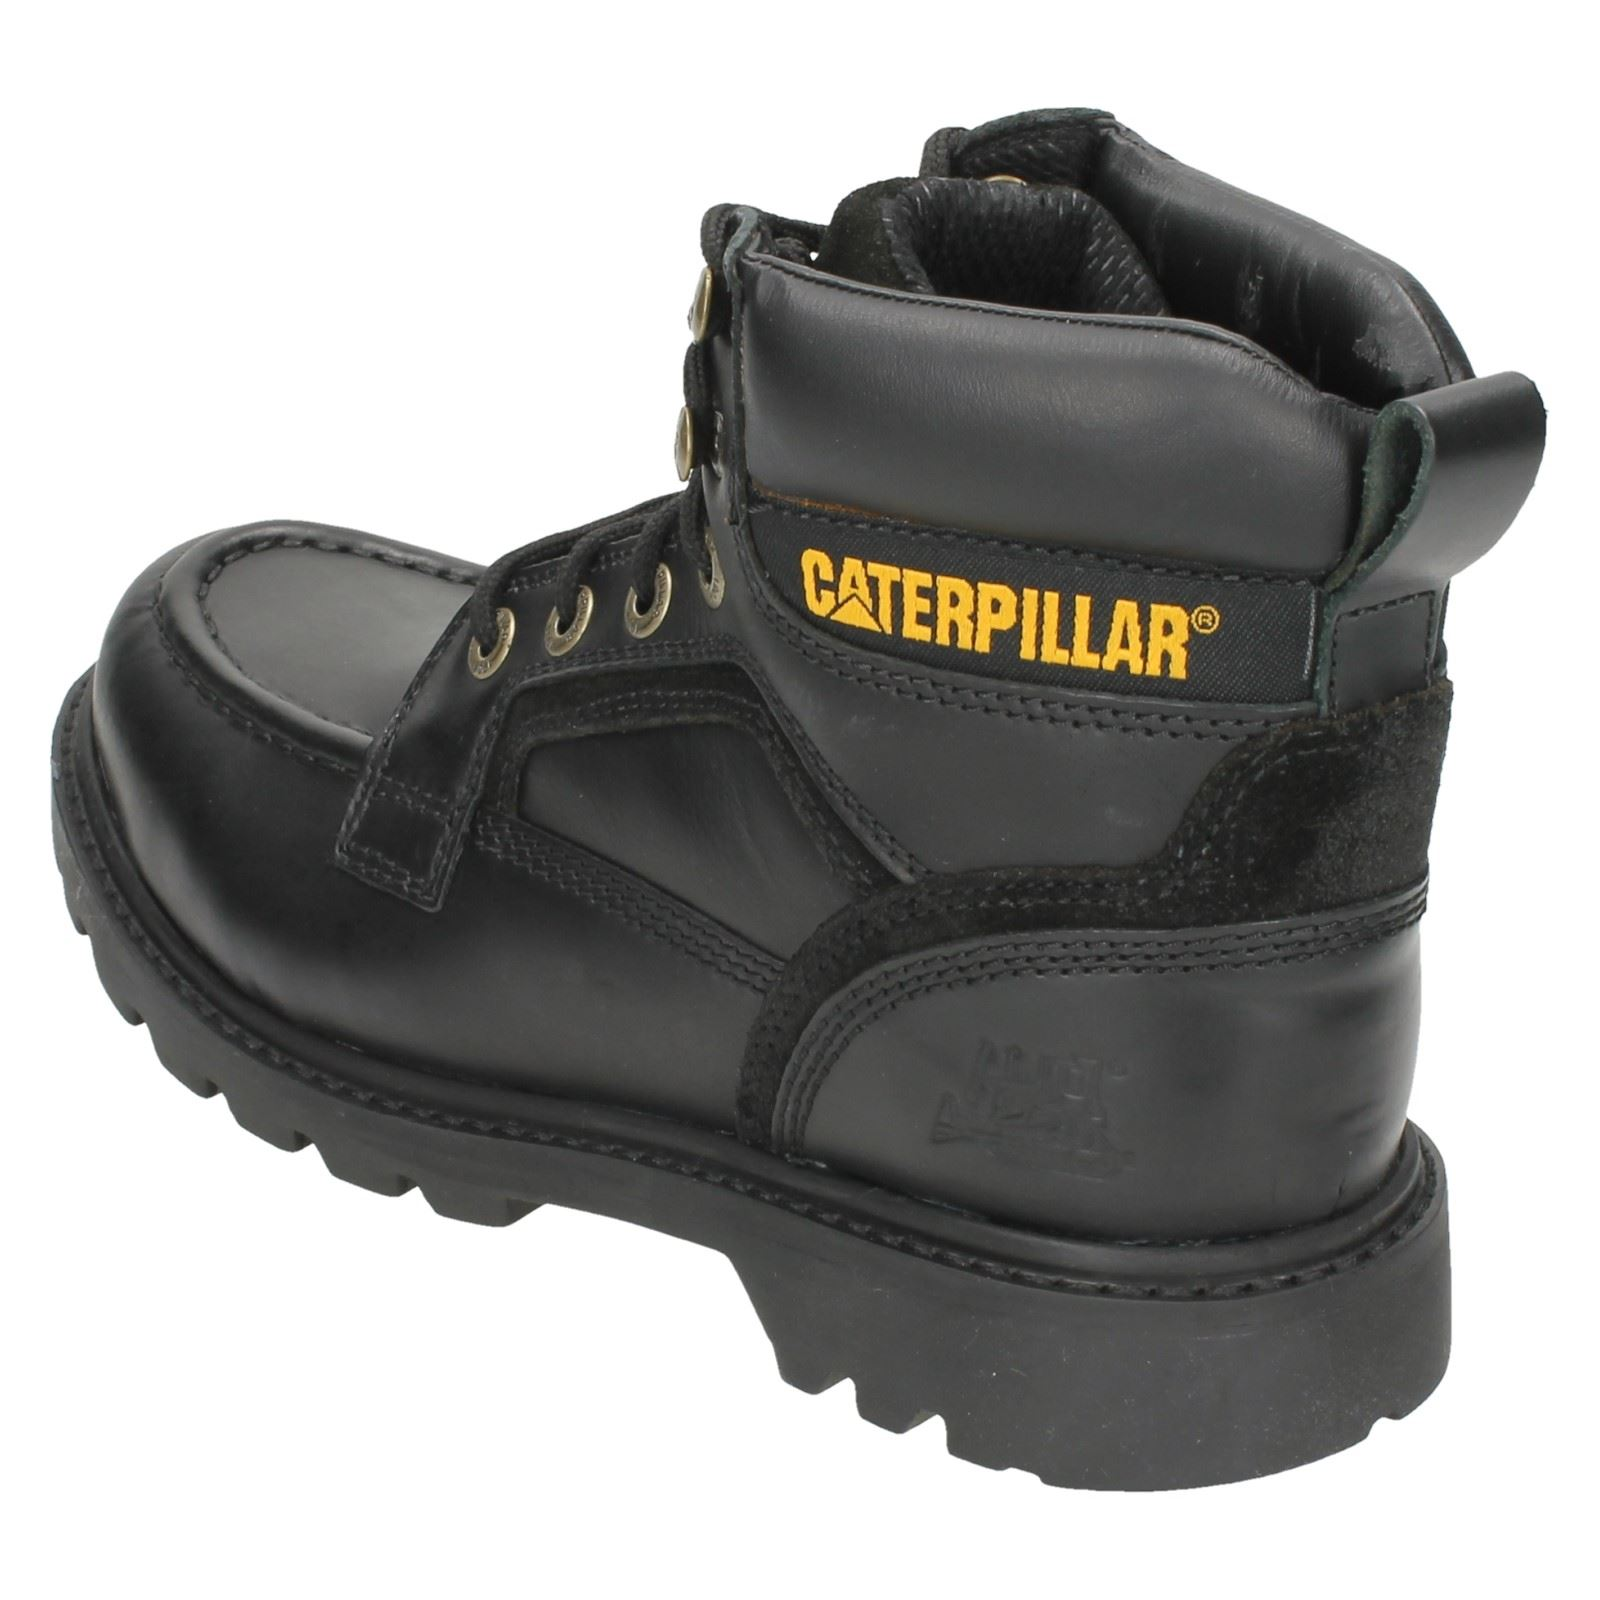 'Mens Caterpillar' Work Boot - Transpose